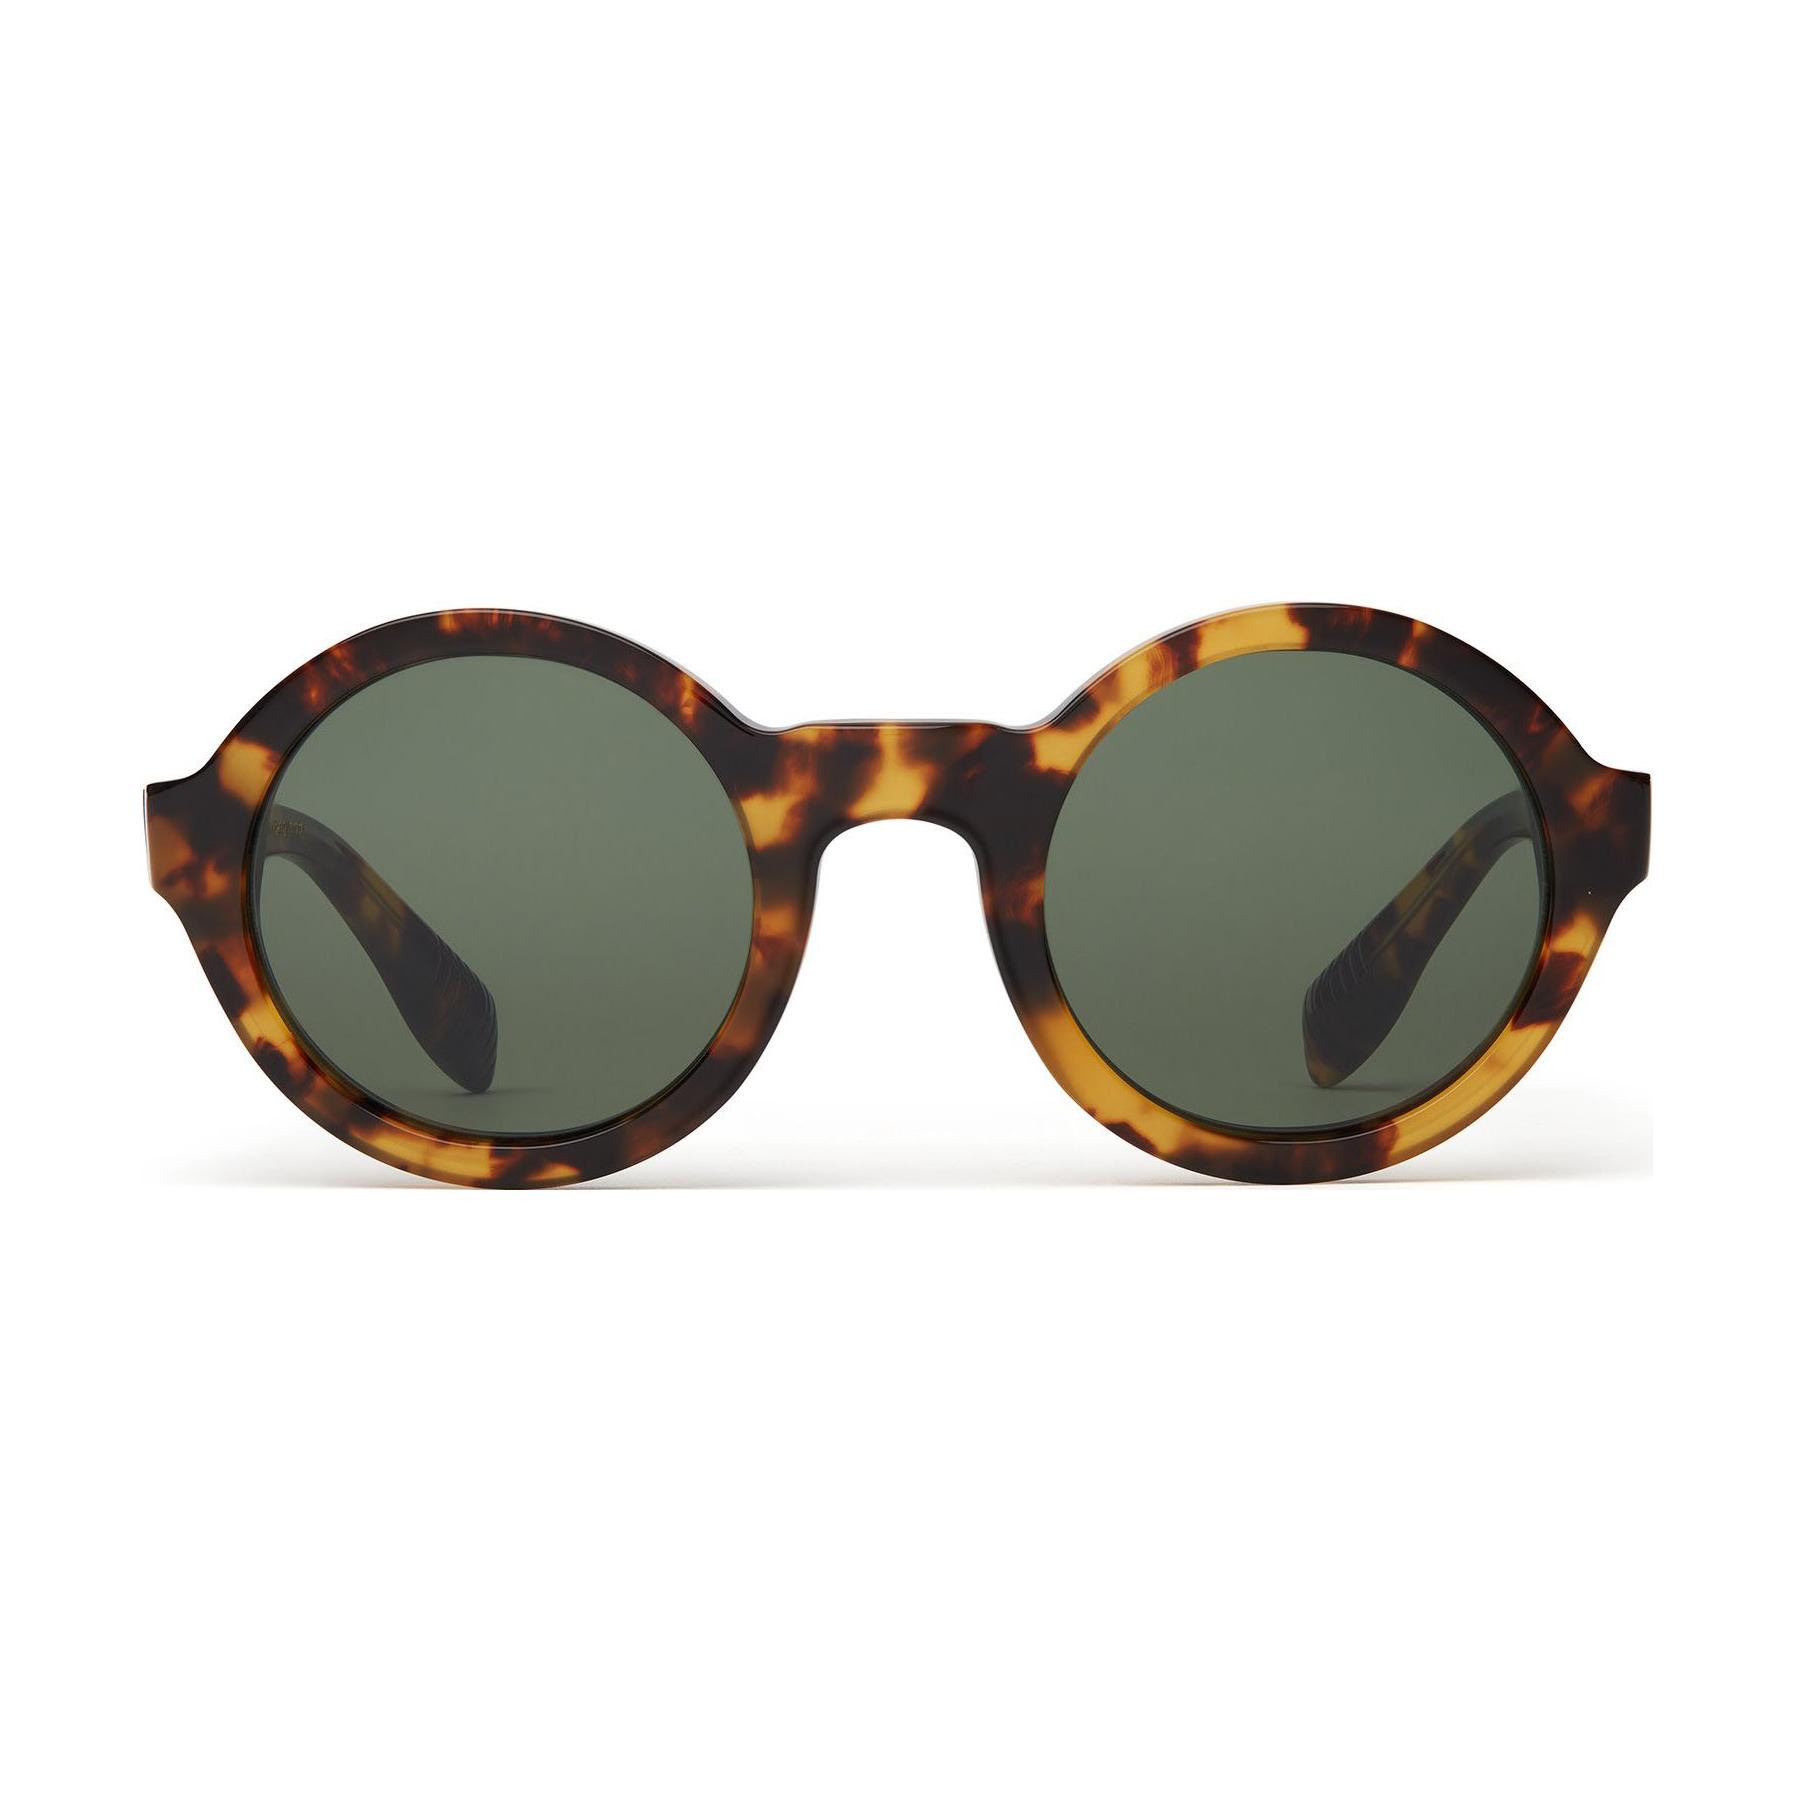 Kirk Originals Hays Bitter Tortoiseshell Sunglasses 45mm Feature